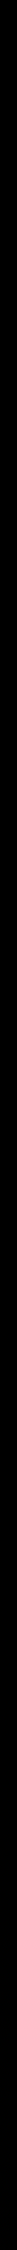 black copy 5.jpg